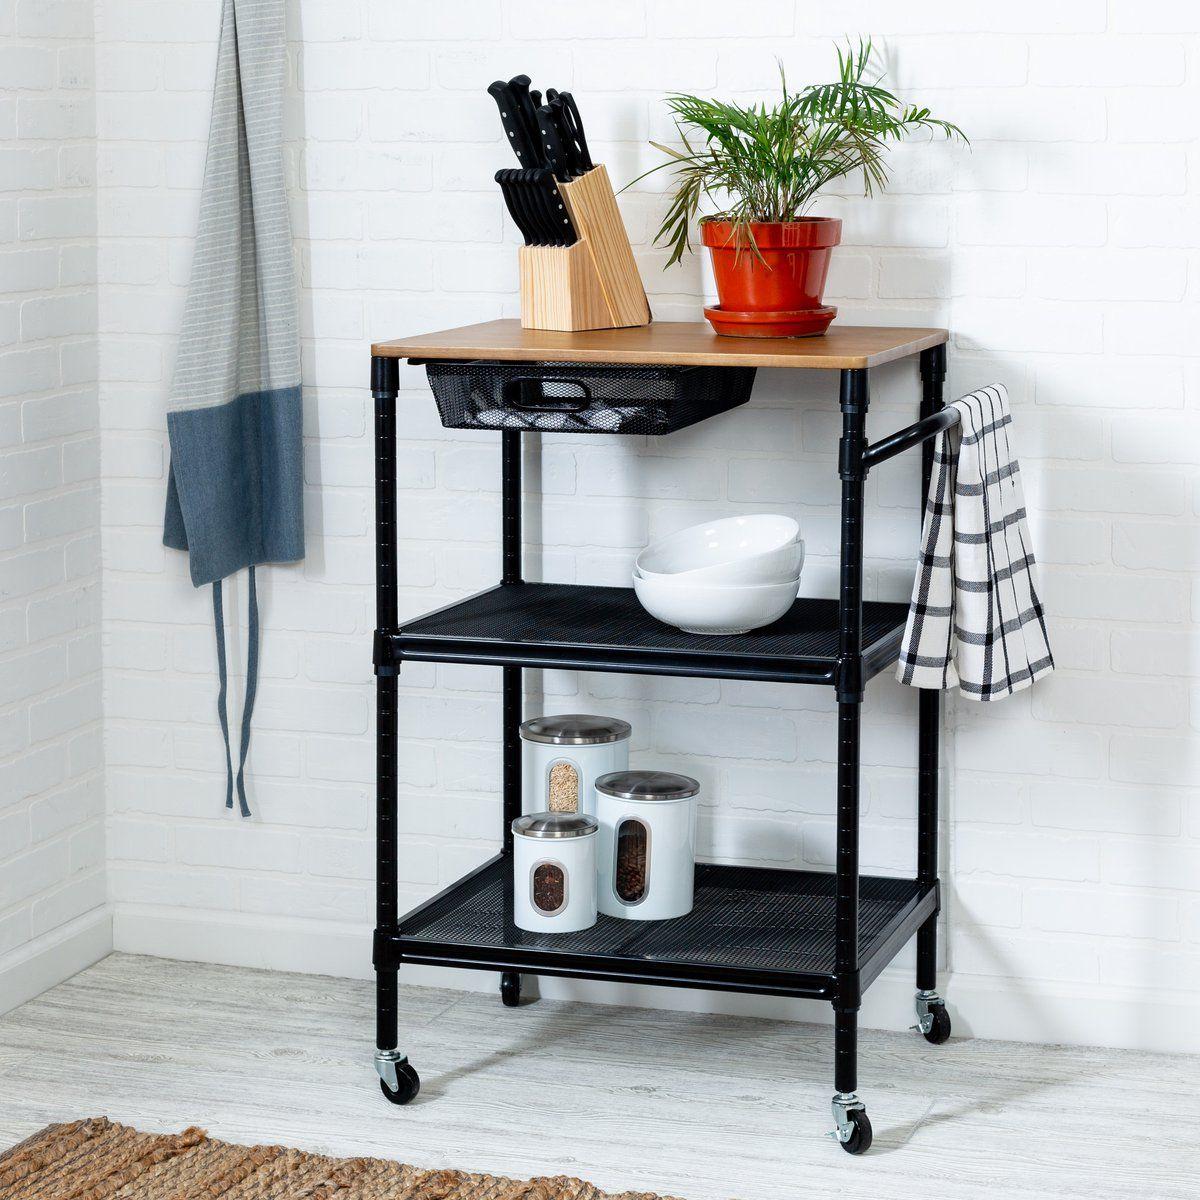 36 Inch Kitchen Storage Cart With Wheels Drawers And Handle Black In 2020 Kitchen Storage Cart Kitchen Storage